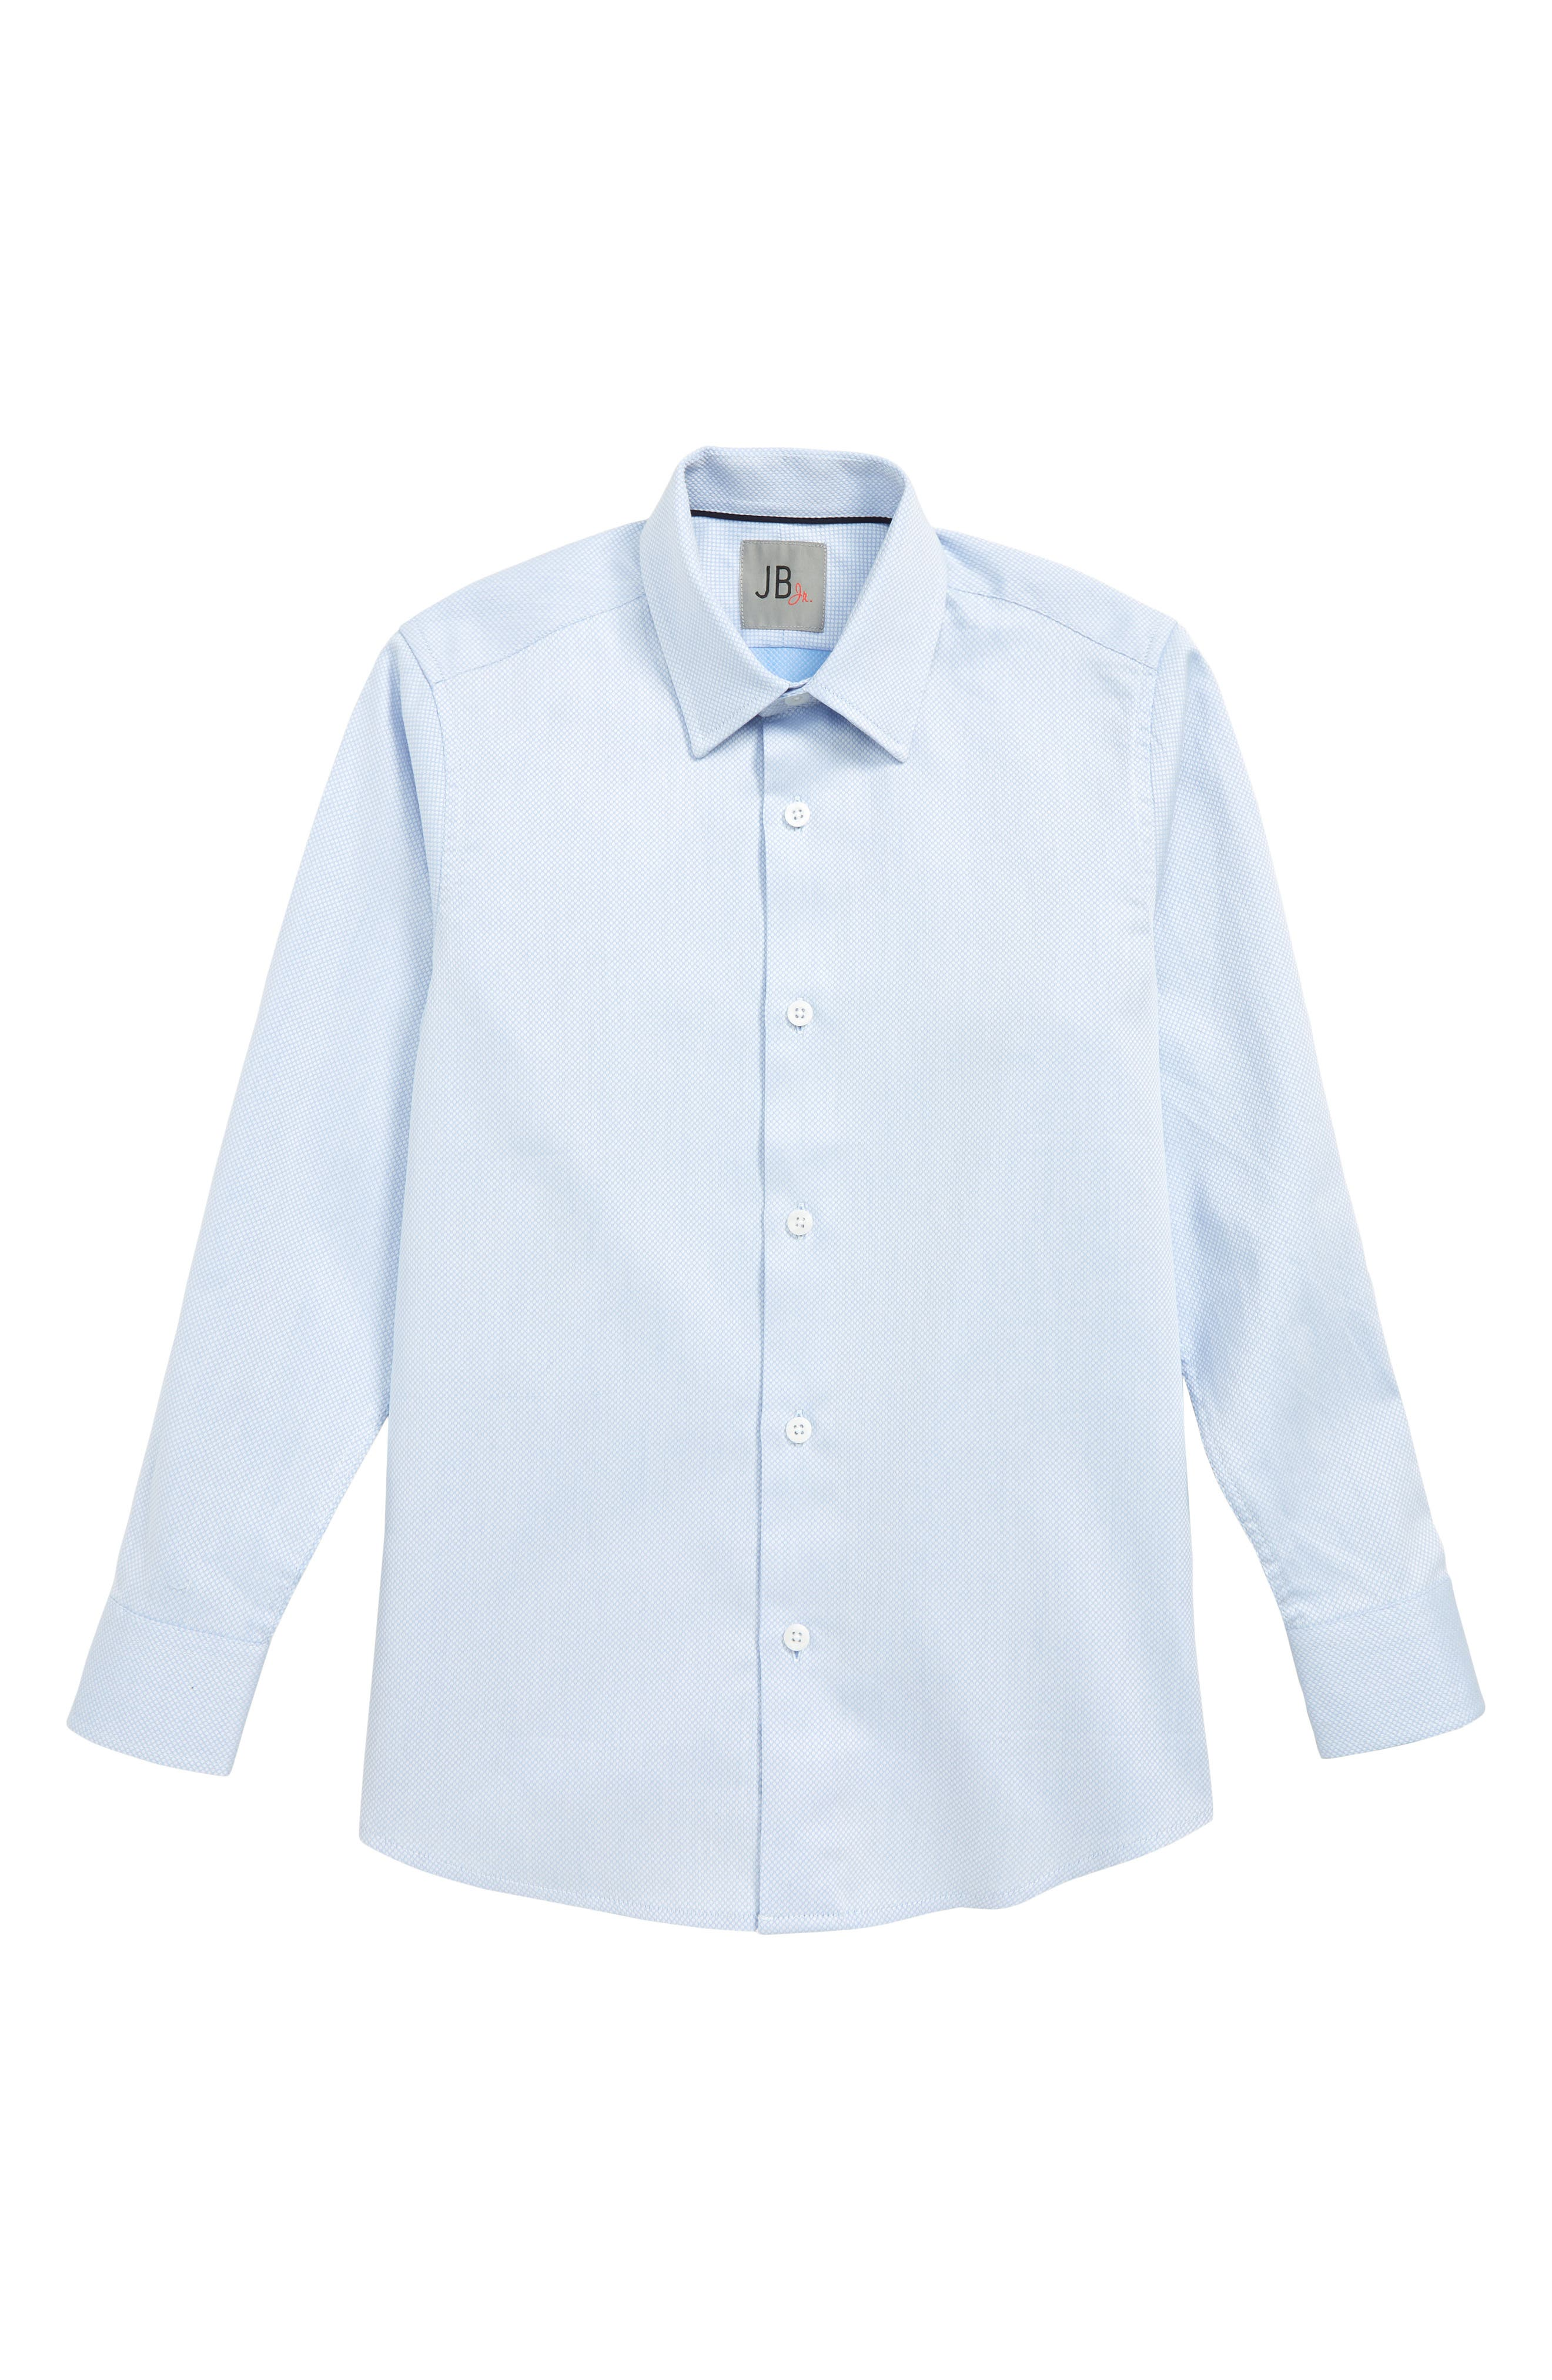 Textured Dress Shirt,                             Main thumbnail 1, color,                             BLUE